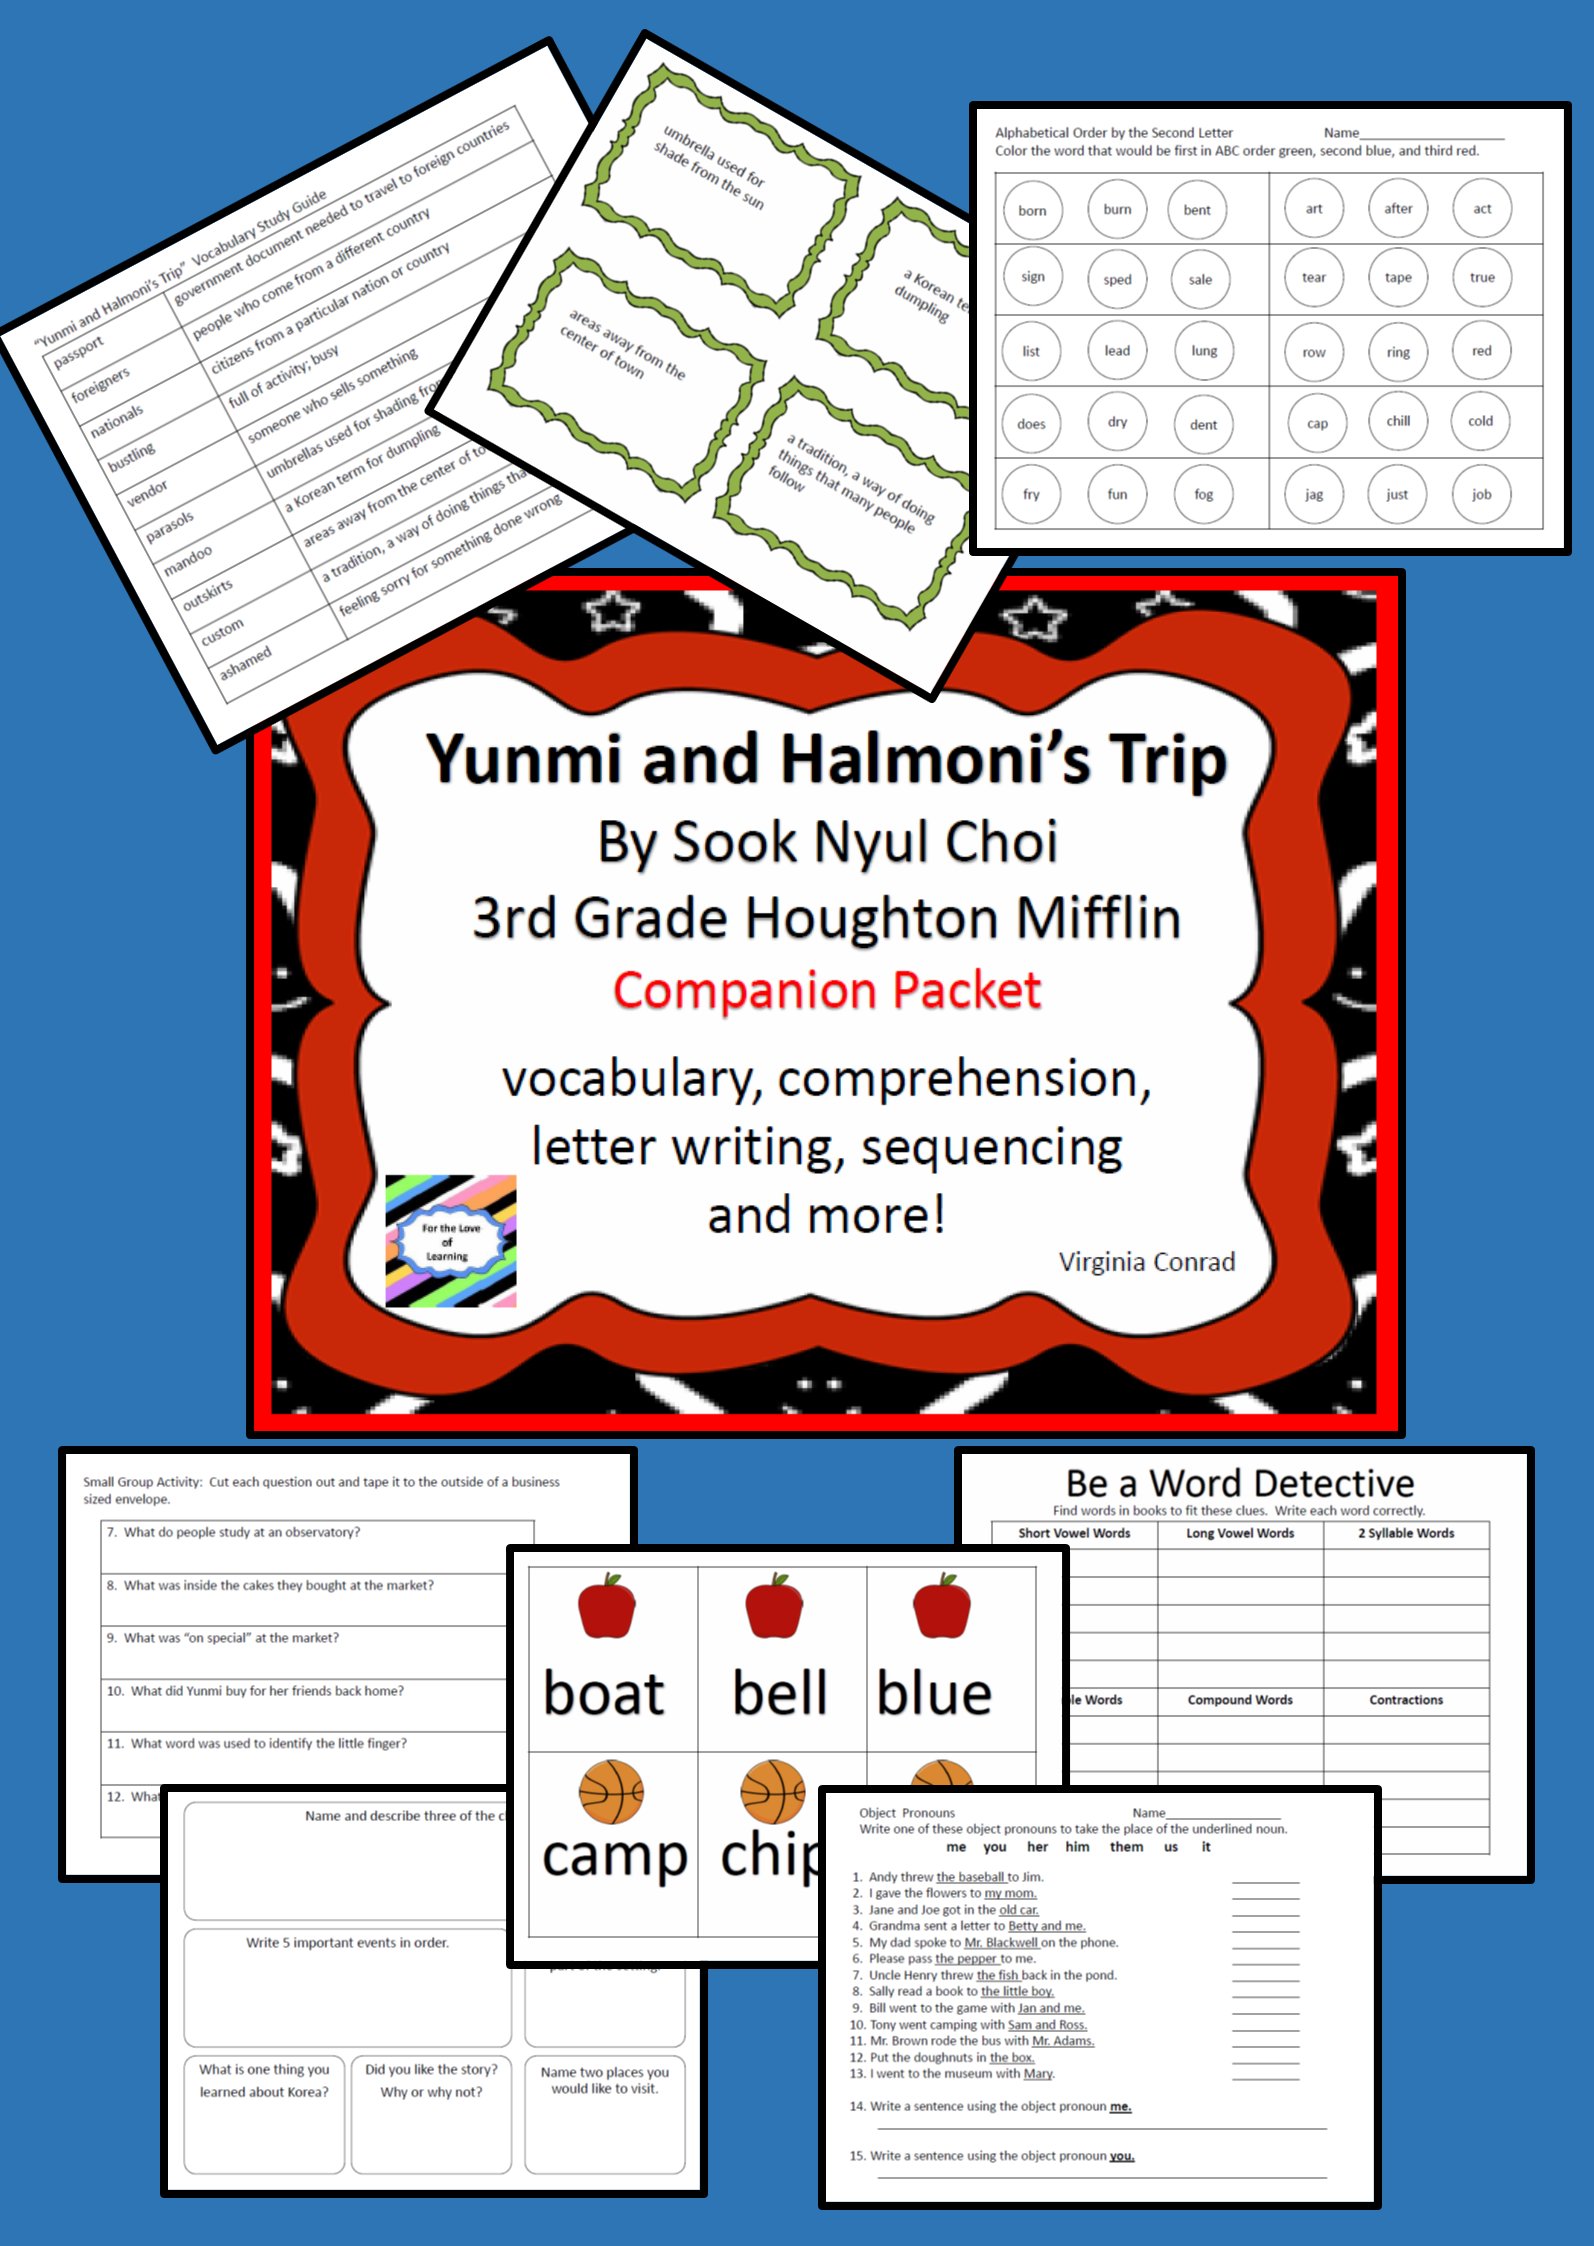 Yunmi And Halmoni S Trip 3rd Grade Houghton Mifflin